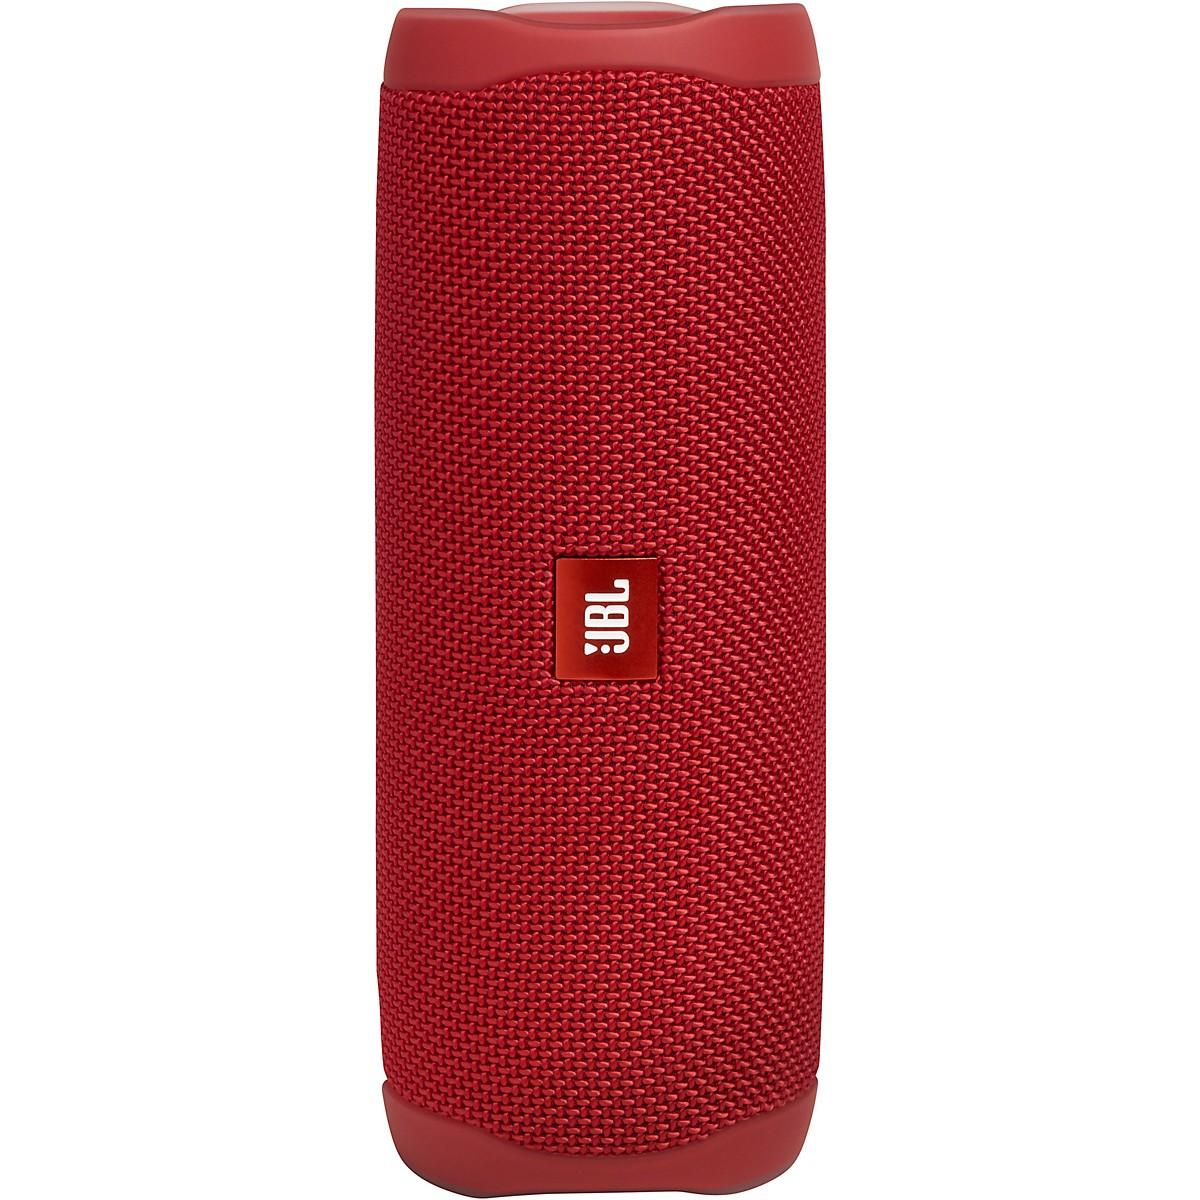 JBL FLIP 5 Waterproof Portable Bluetooth Speaker w/ built in battery and microphone